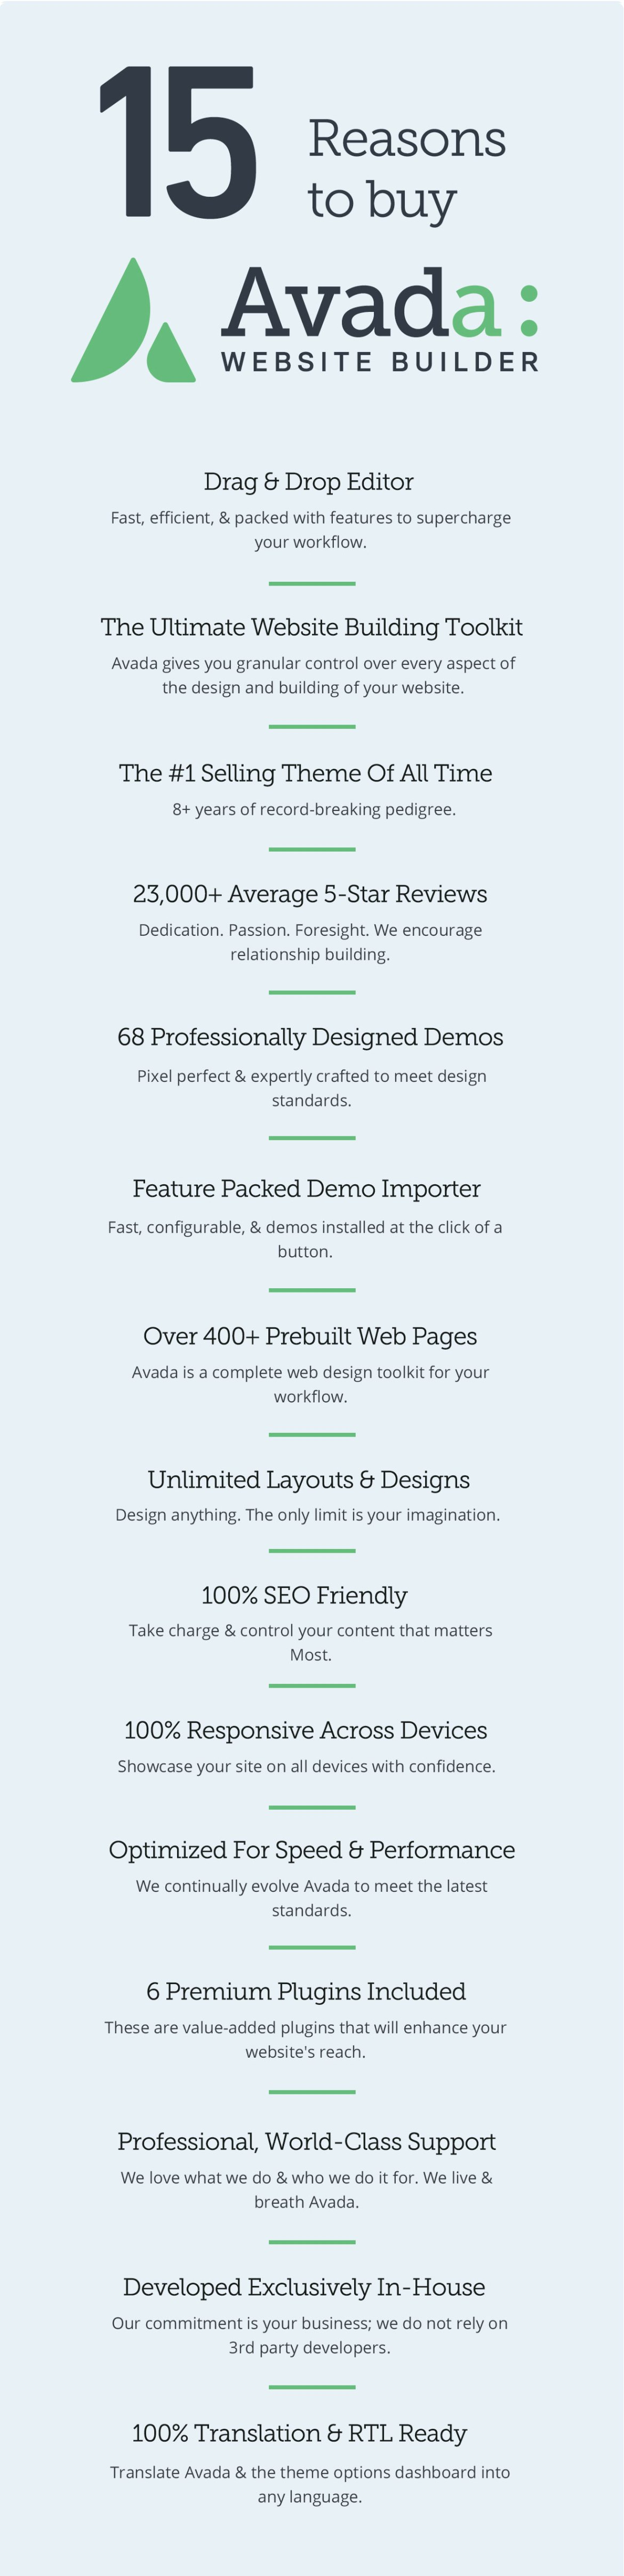 Avada | Website Builder For WordPress & WooCommerce - 27